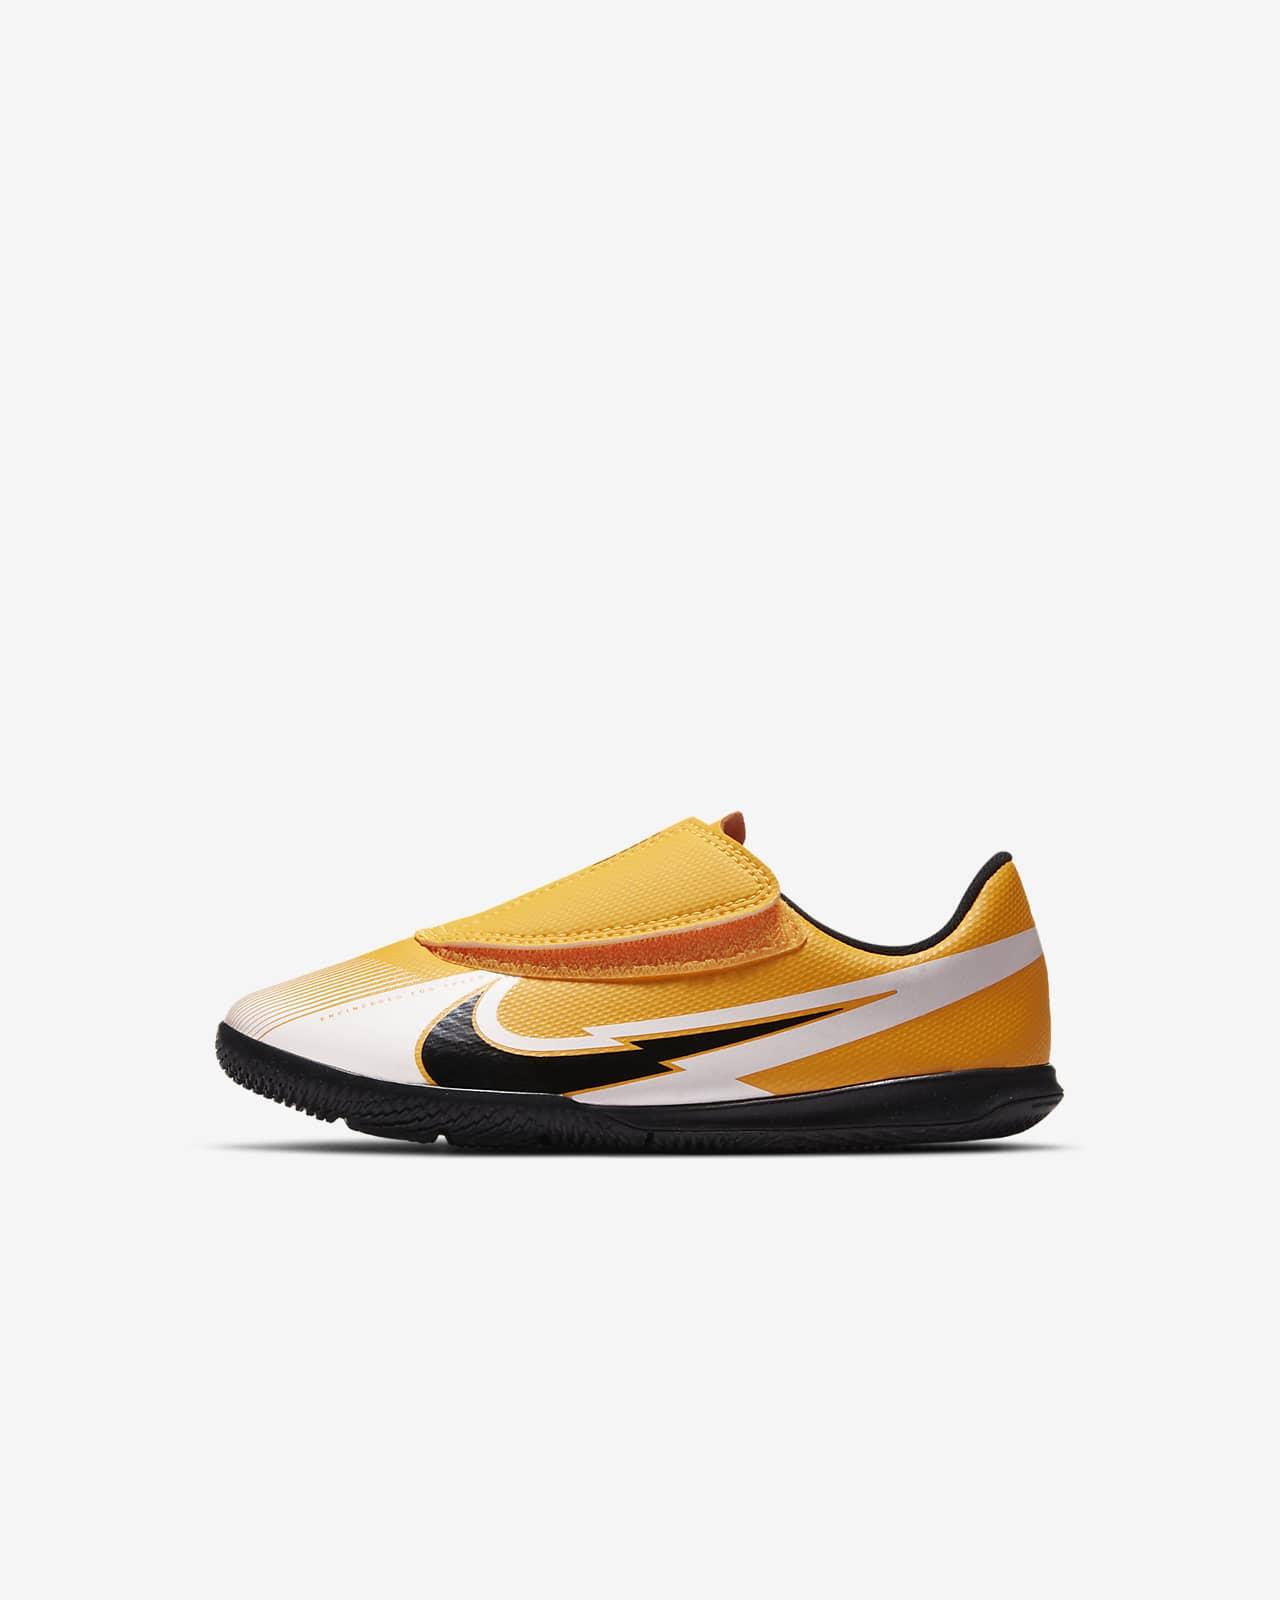 Nike Jr. Mercurial Vapor 13 Club IC Toddler/Younger Kids' Indoor/Court Football Shoe